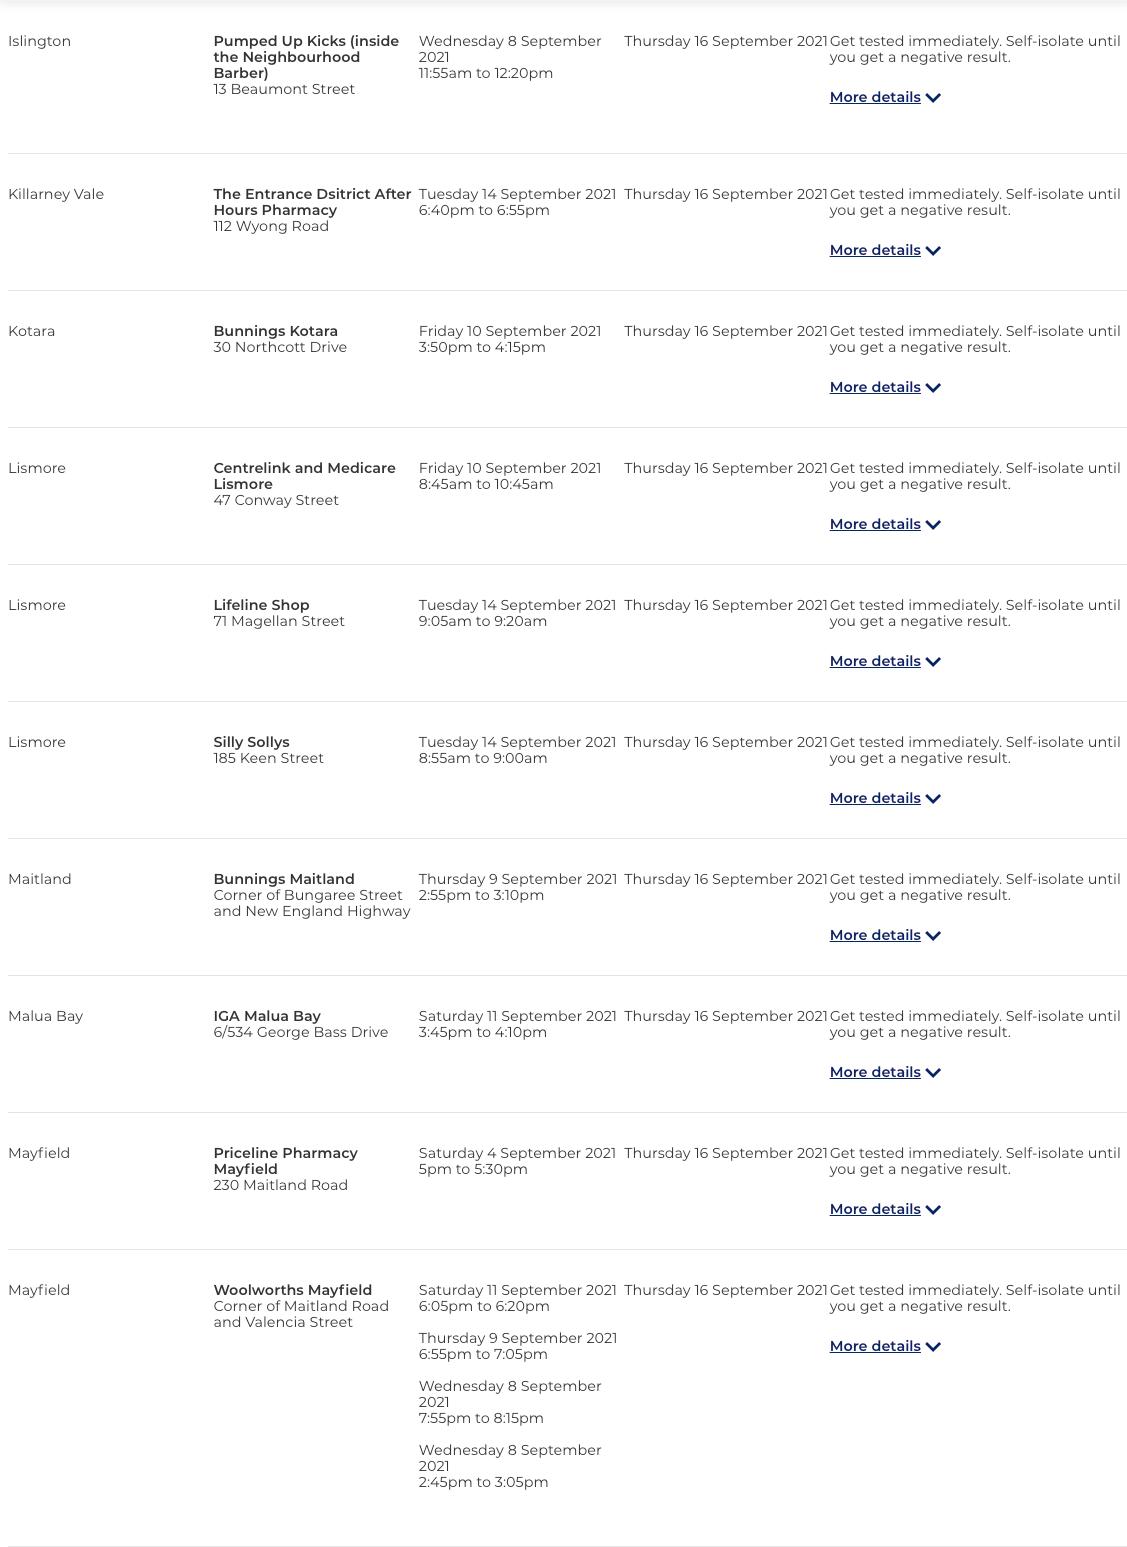 www.nsw.gov.au_covid-19_nsw-covid-19-case-locations_case-locations (2)的副本.png